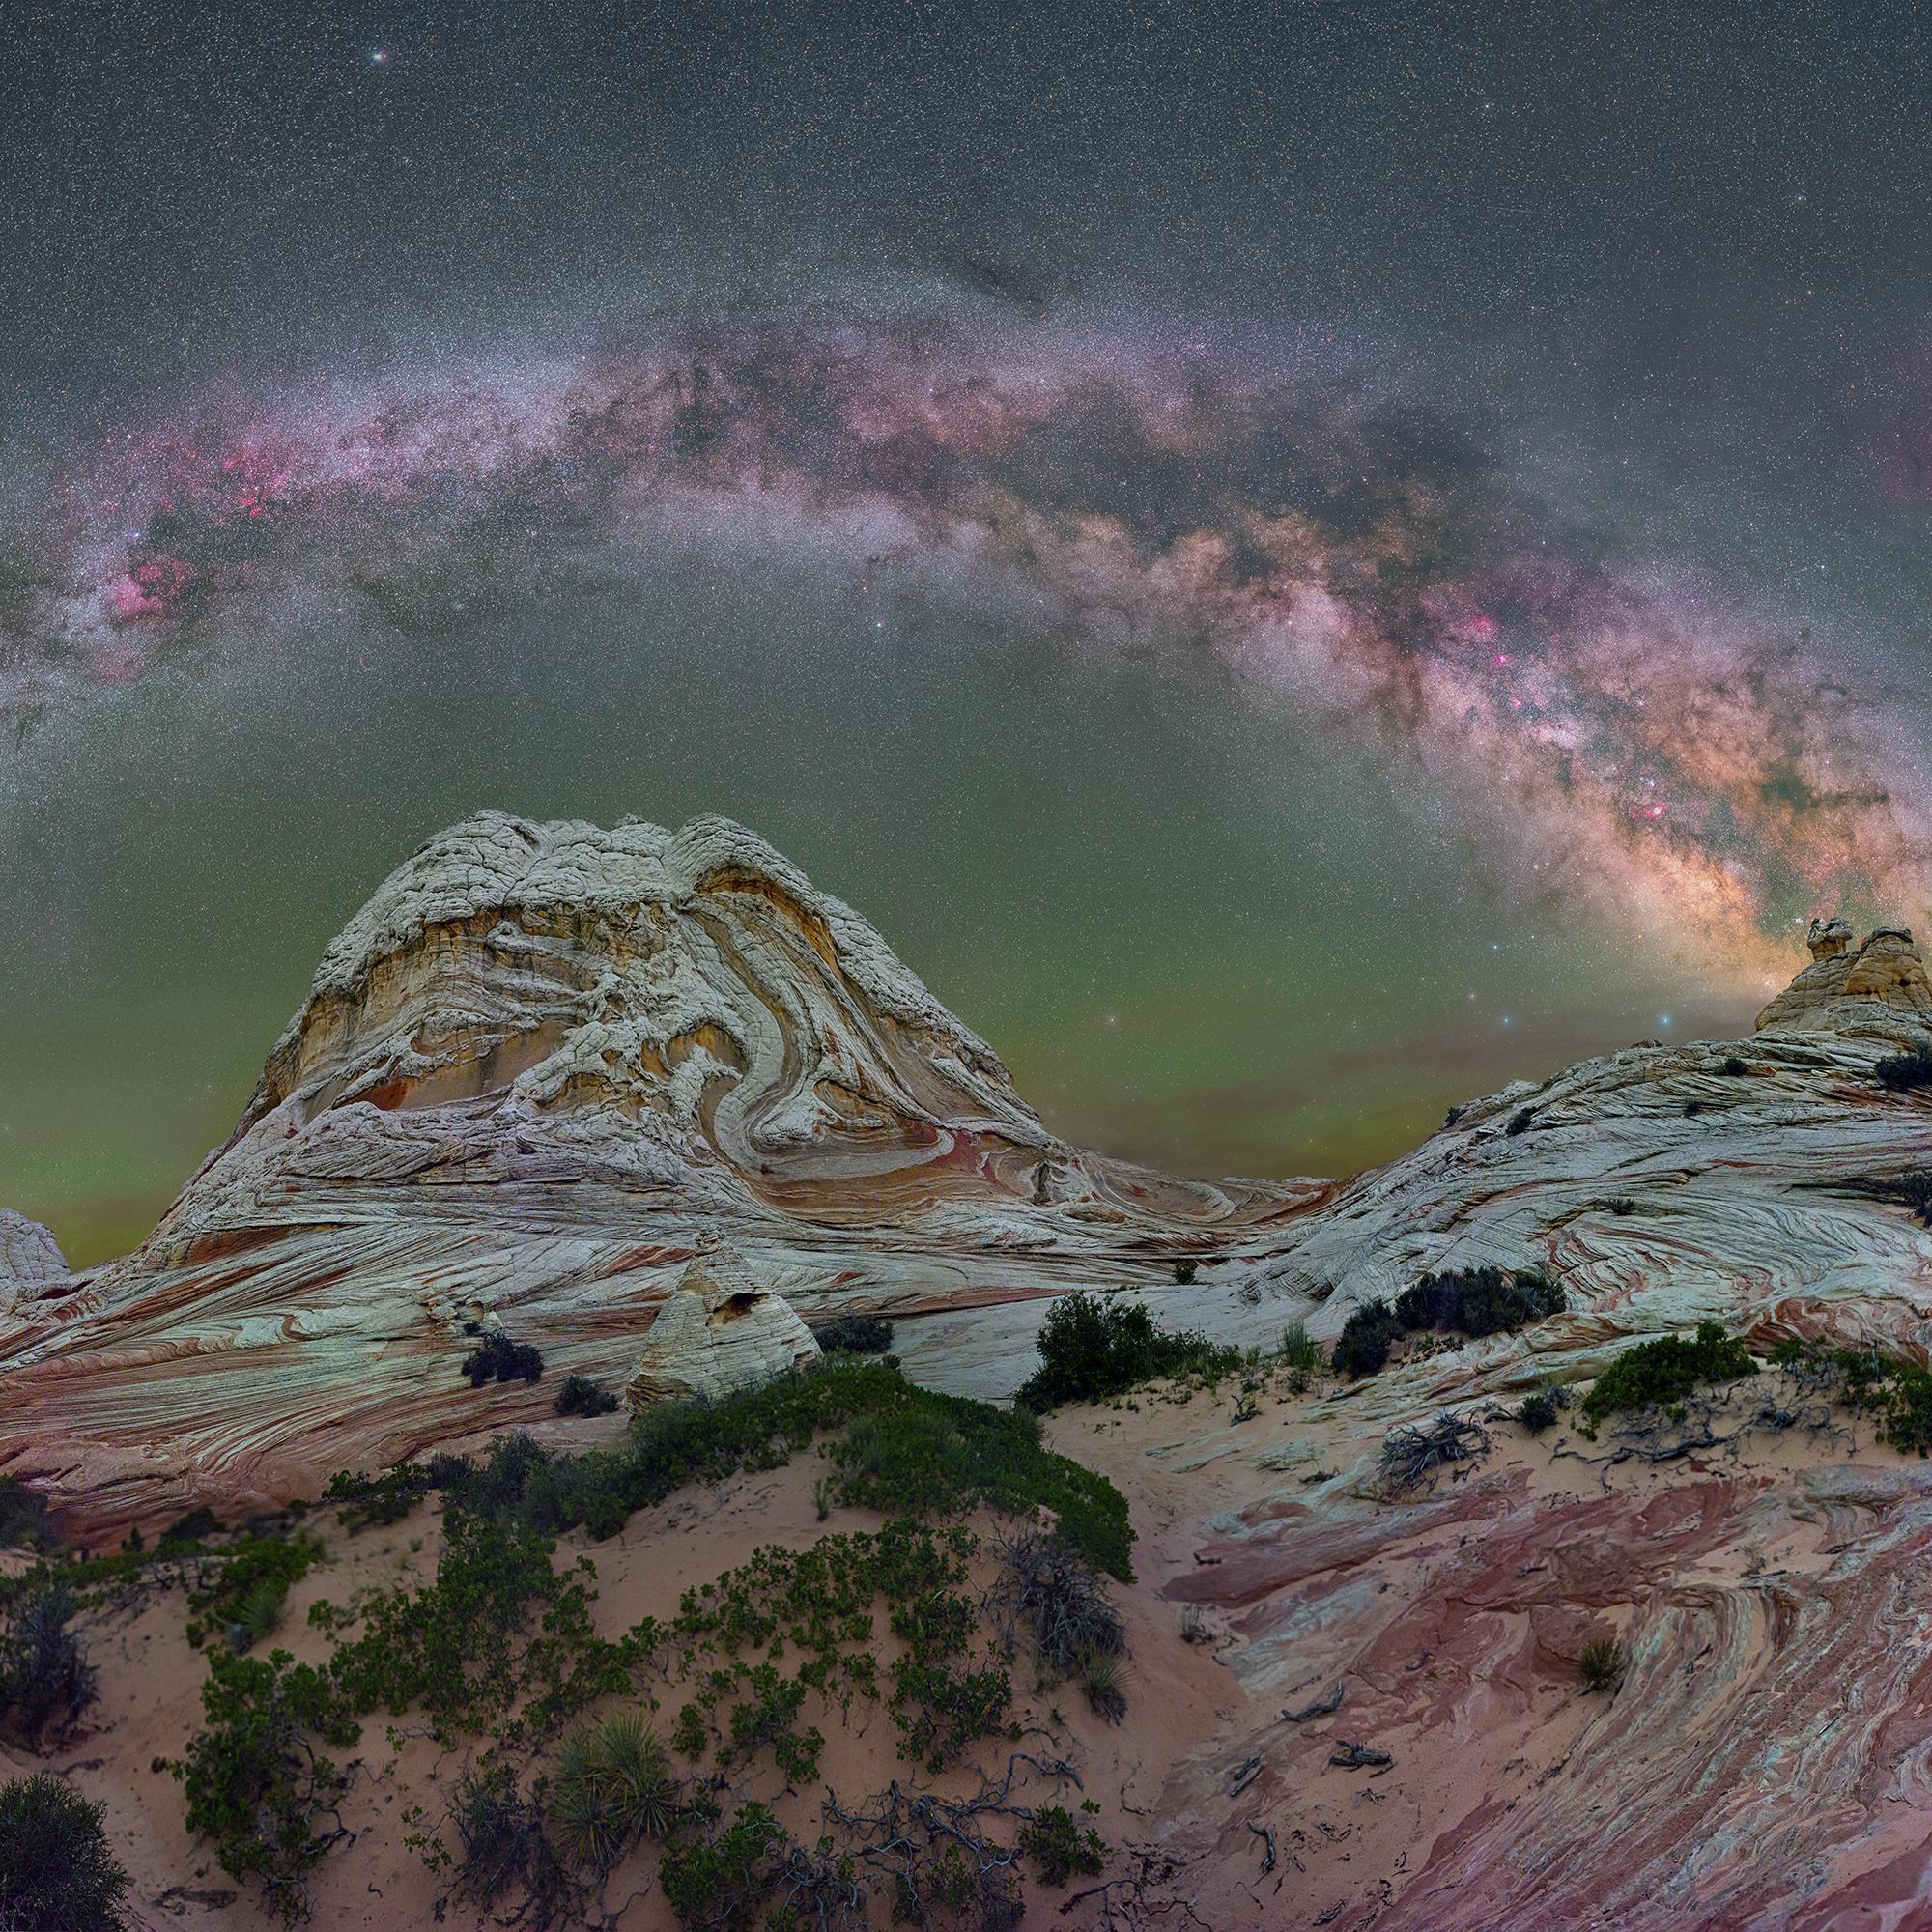 astrodave